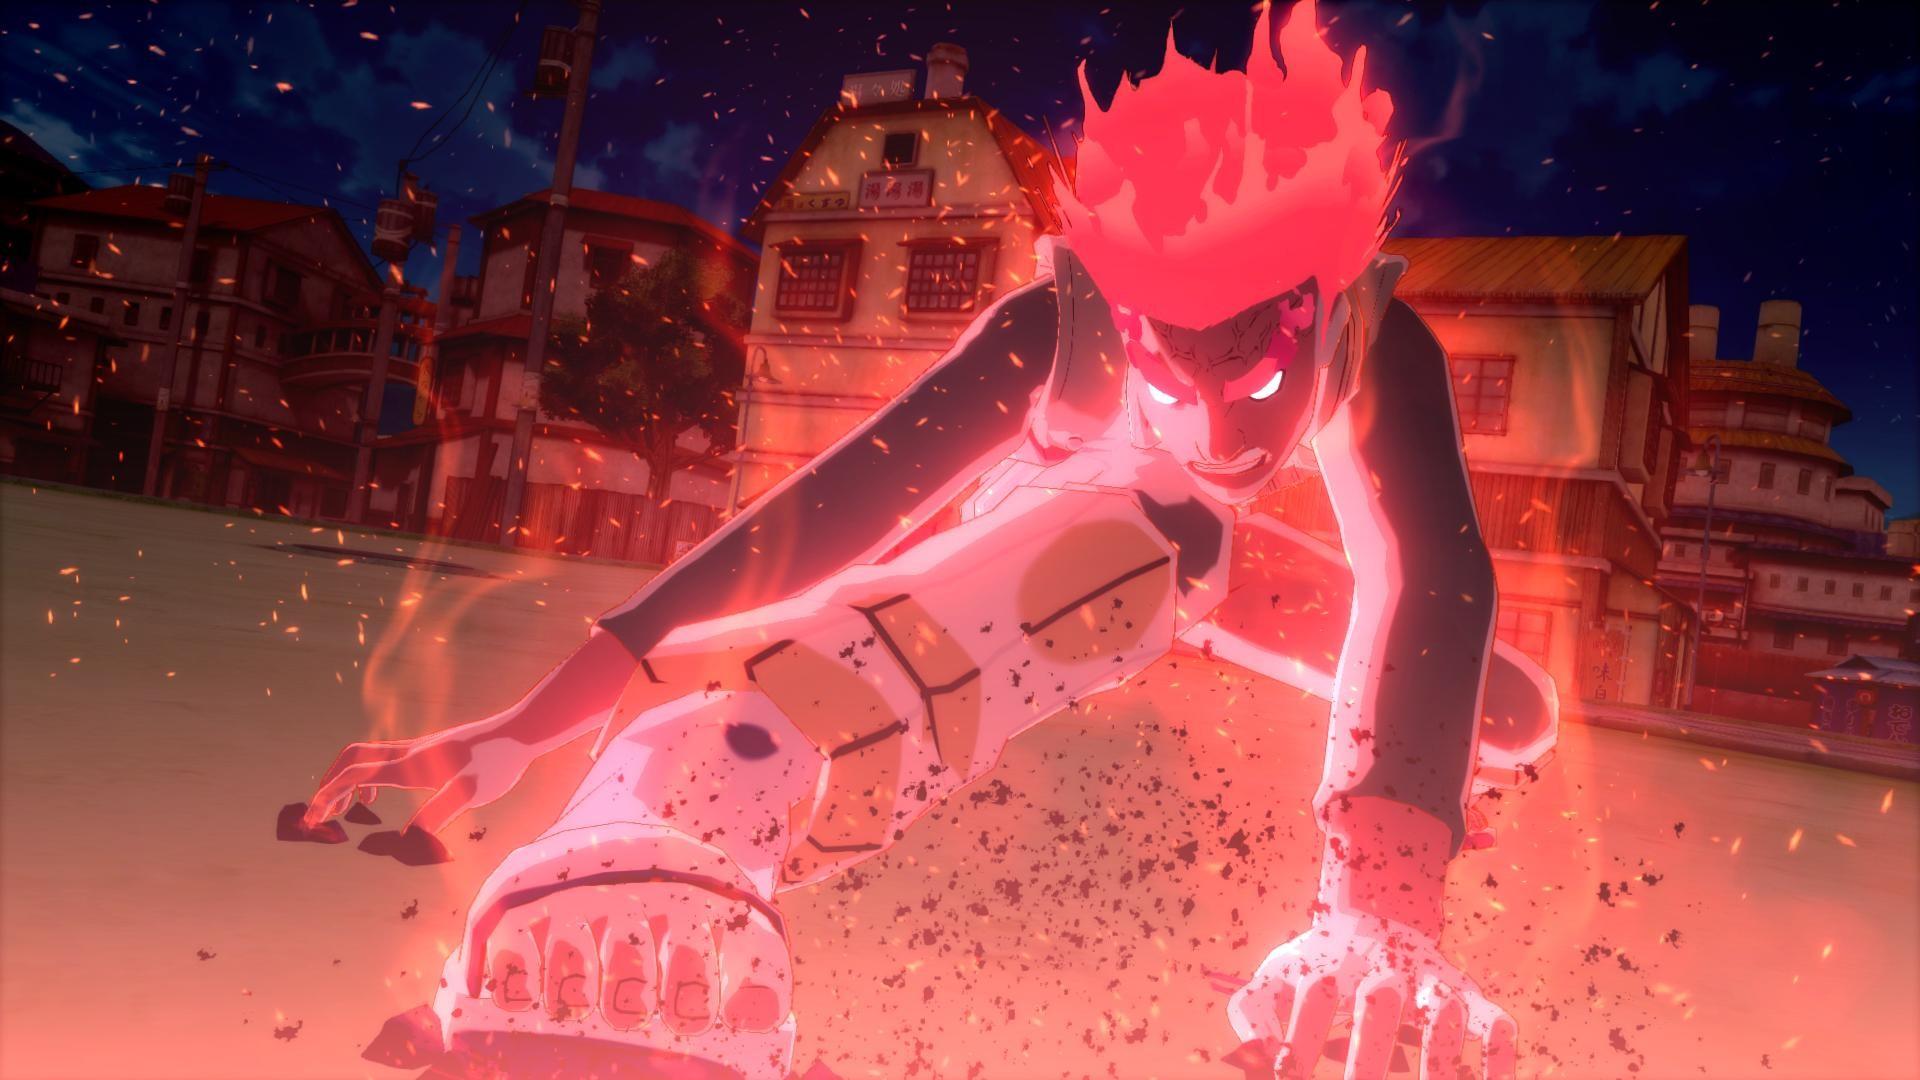 Video Game – Naruto Shippuden: Ultimate Ninja Storm 4 Gaï Maito Wallpaper